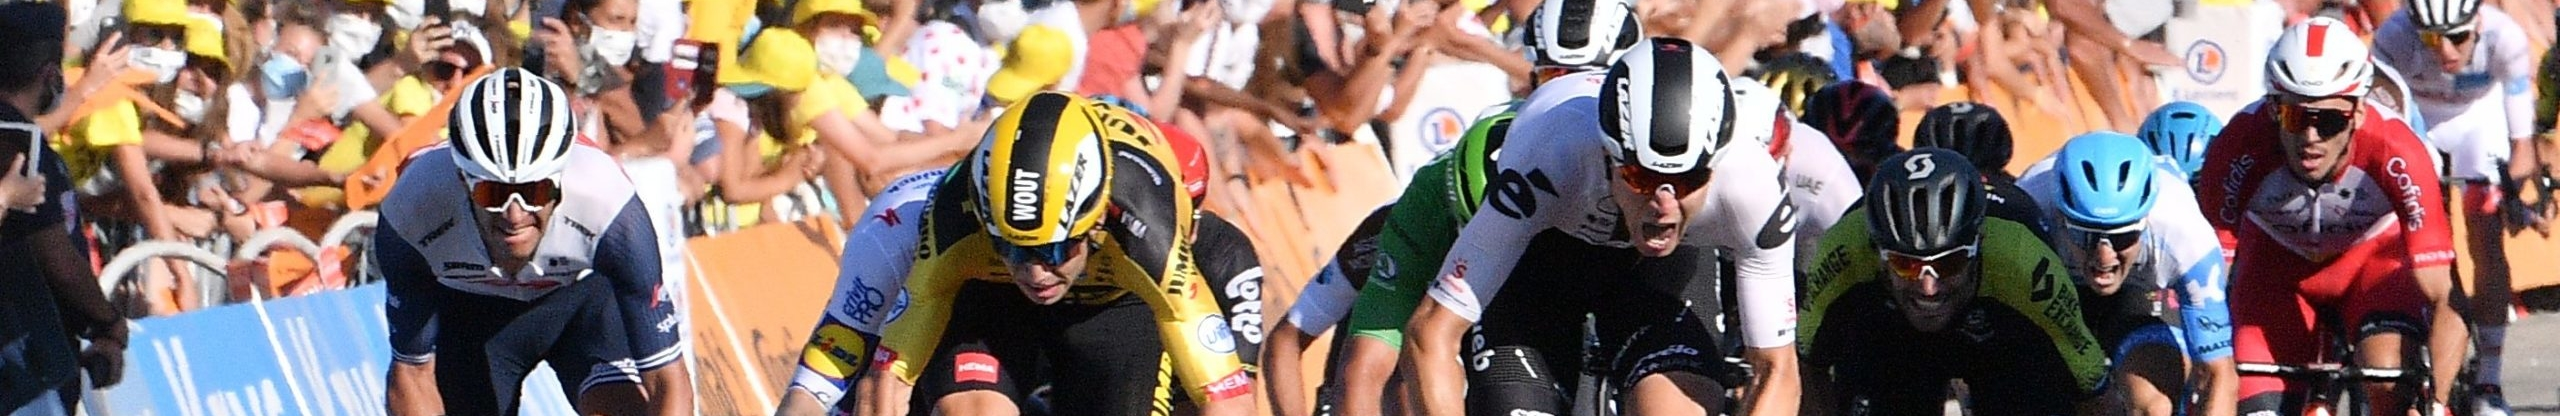 Tour de France 2020, quote e favoriti per la tappa 21: Au revoir Grande Boucle!